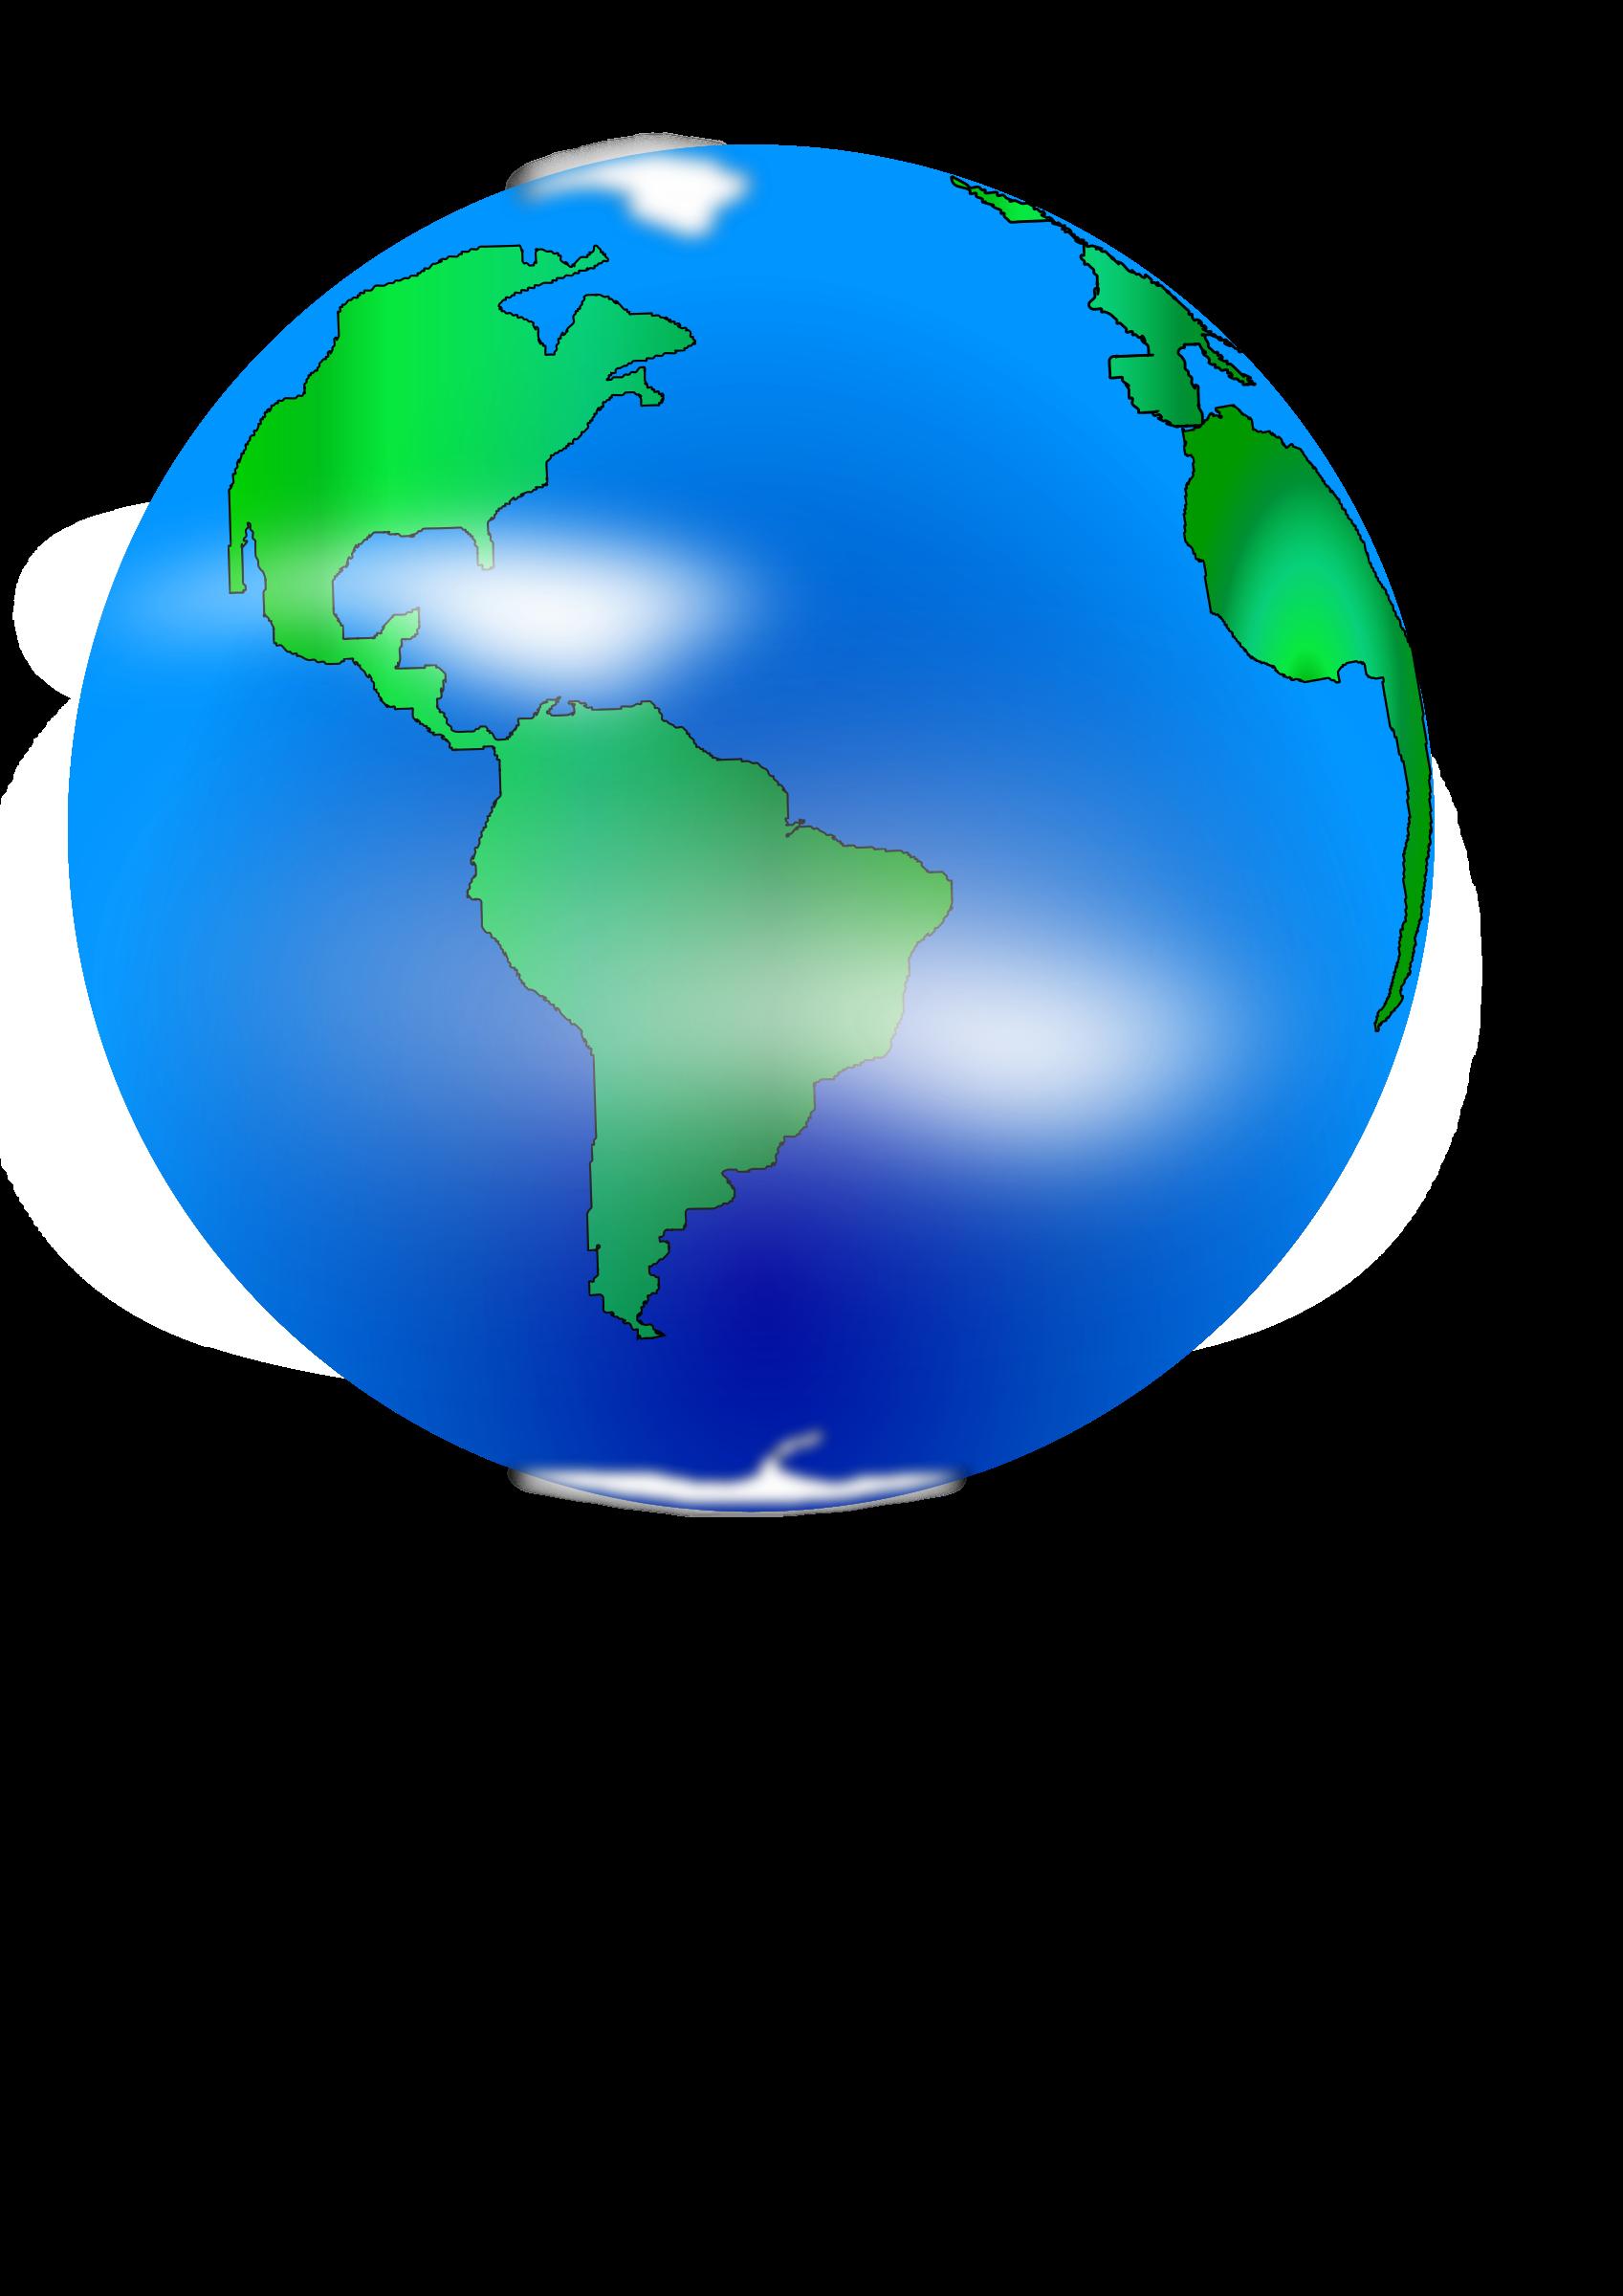 Planet clipart tierra. Planeta earth big image